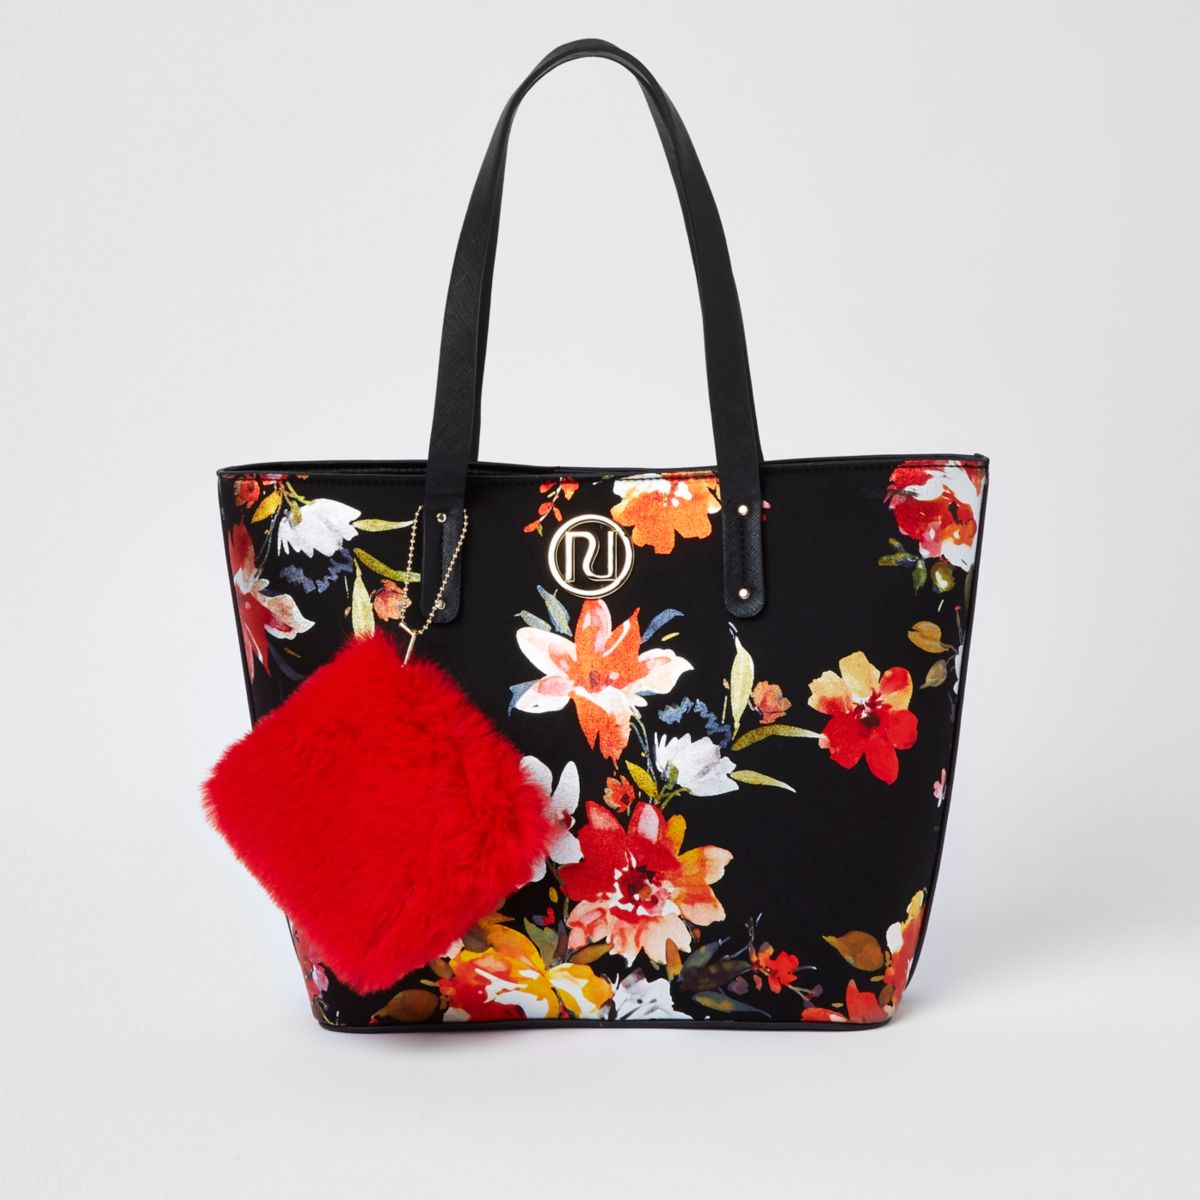 Girls black RI floral print shopper